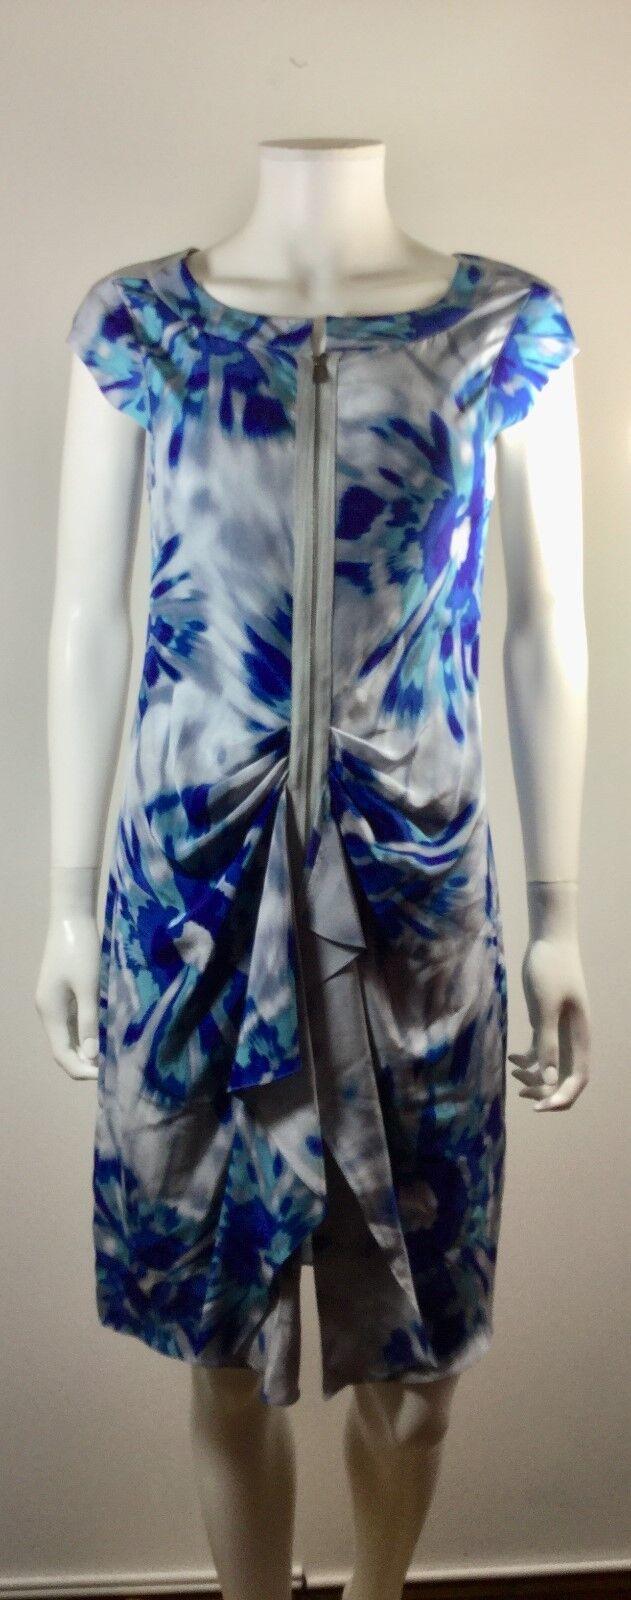 BCBGMAXAZRIA bluee Print Cap Sleeve Zip Front Marisol Dress Size 4